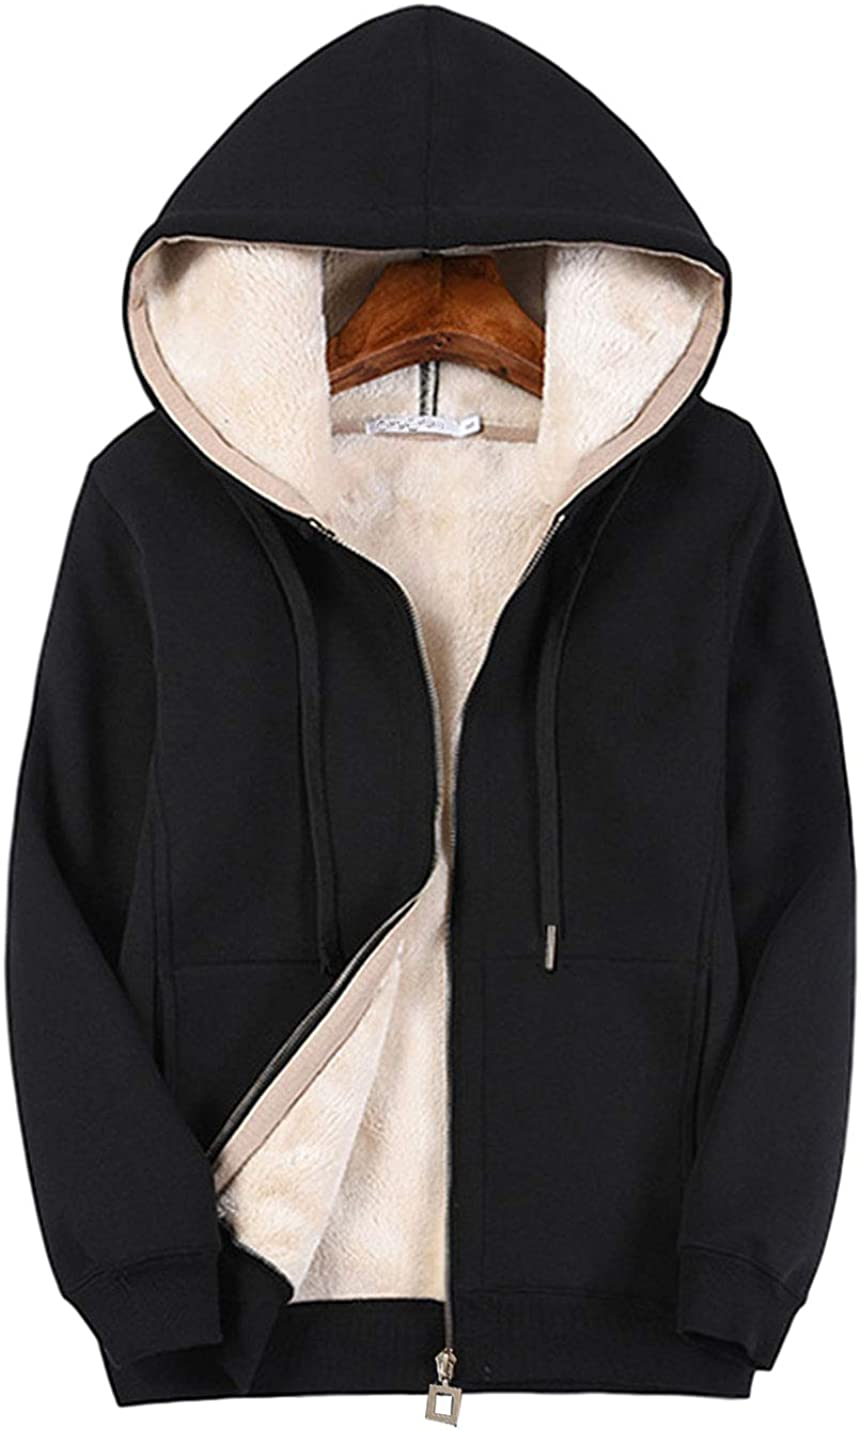 PUWEI Women's Warm Sherpa Fleece Lined Zip Up Hooded Sweatshirt Jacket Coat